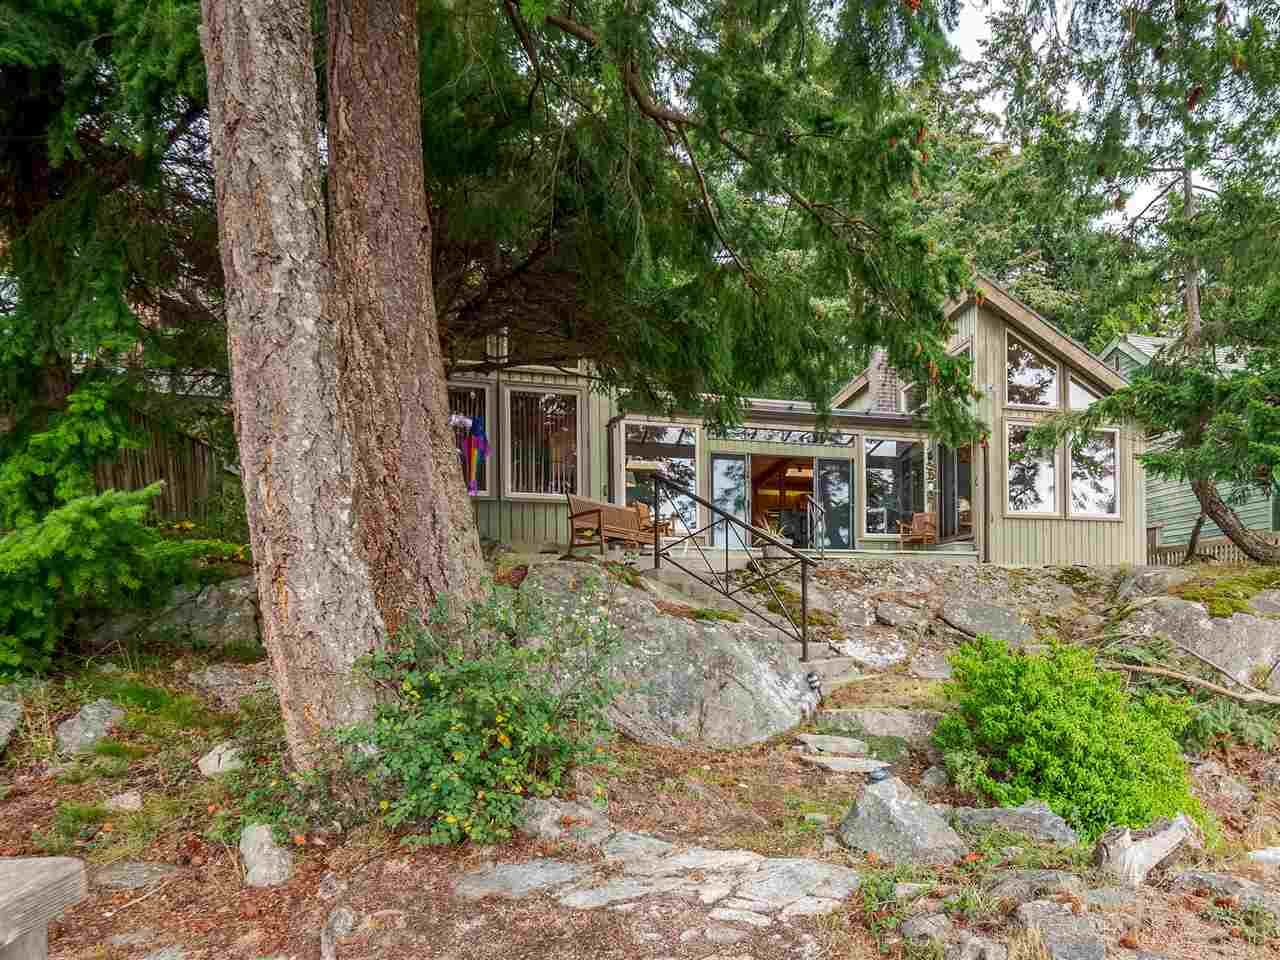 Main Photo: 9185 HYDAWAY Road in Sechelt: Halfmn Bay Secret Cv Redroofs House for sale (Sunshine Coast)  : MLS®# R2504559